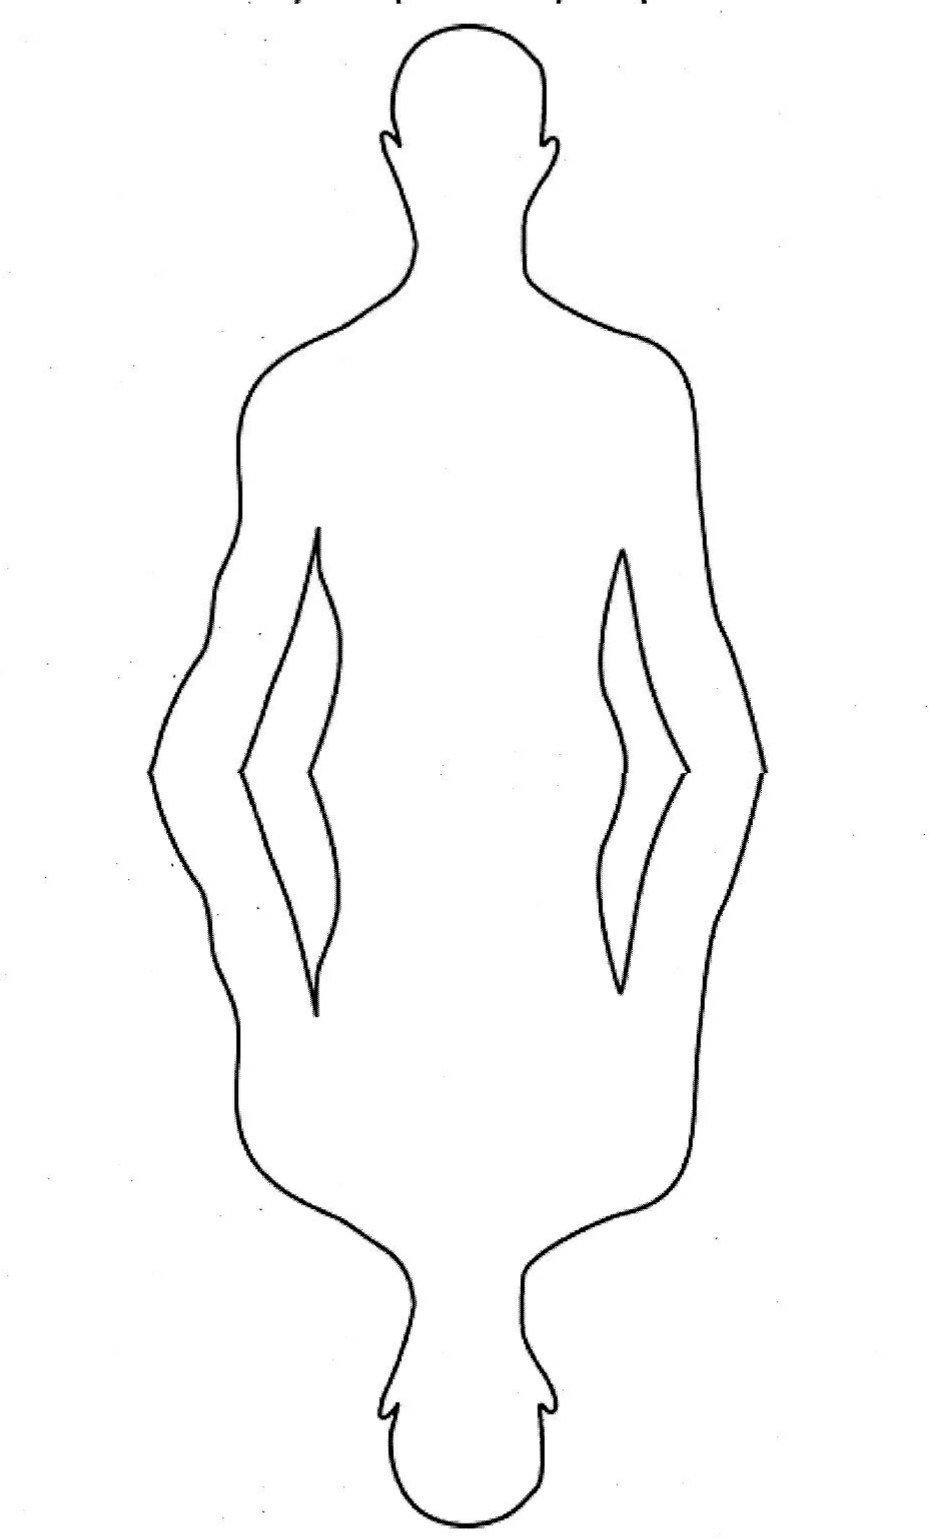 vertically symmetric human